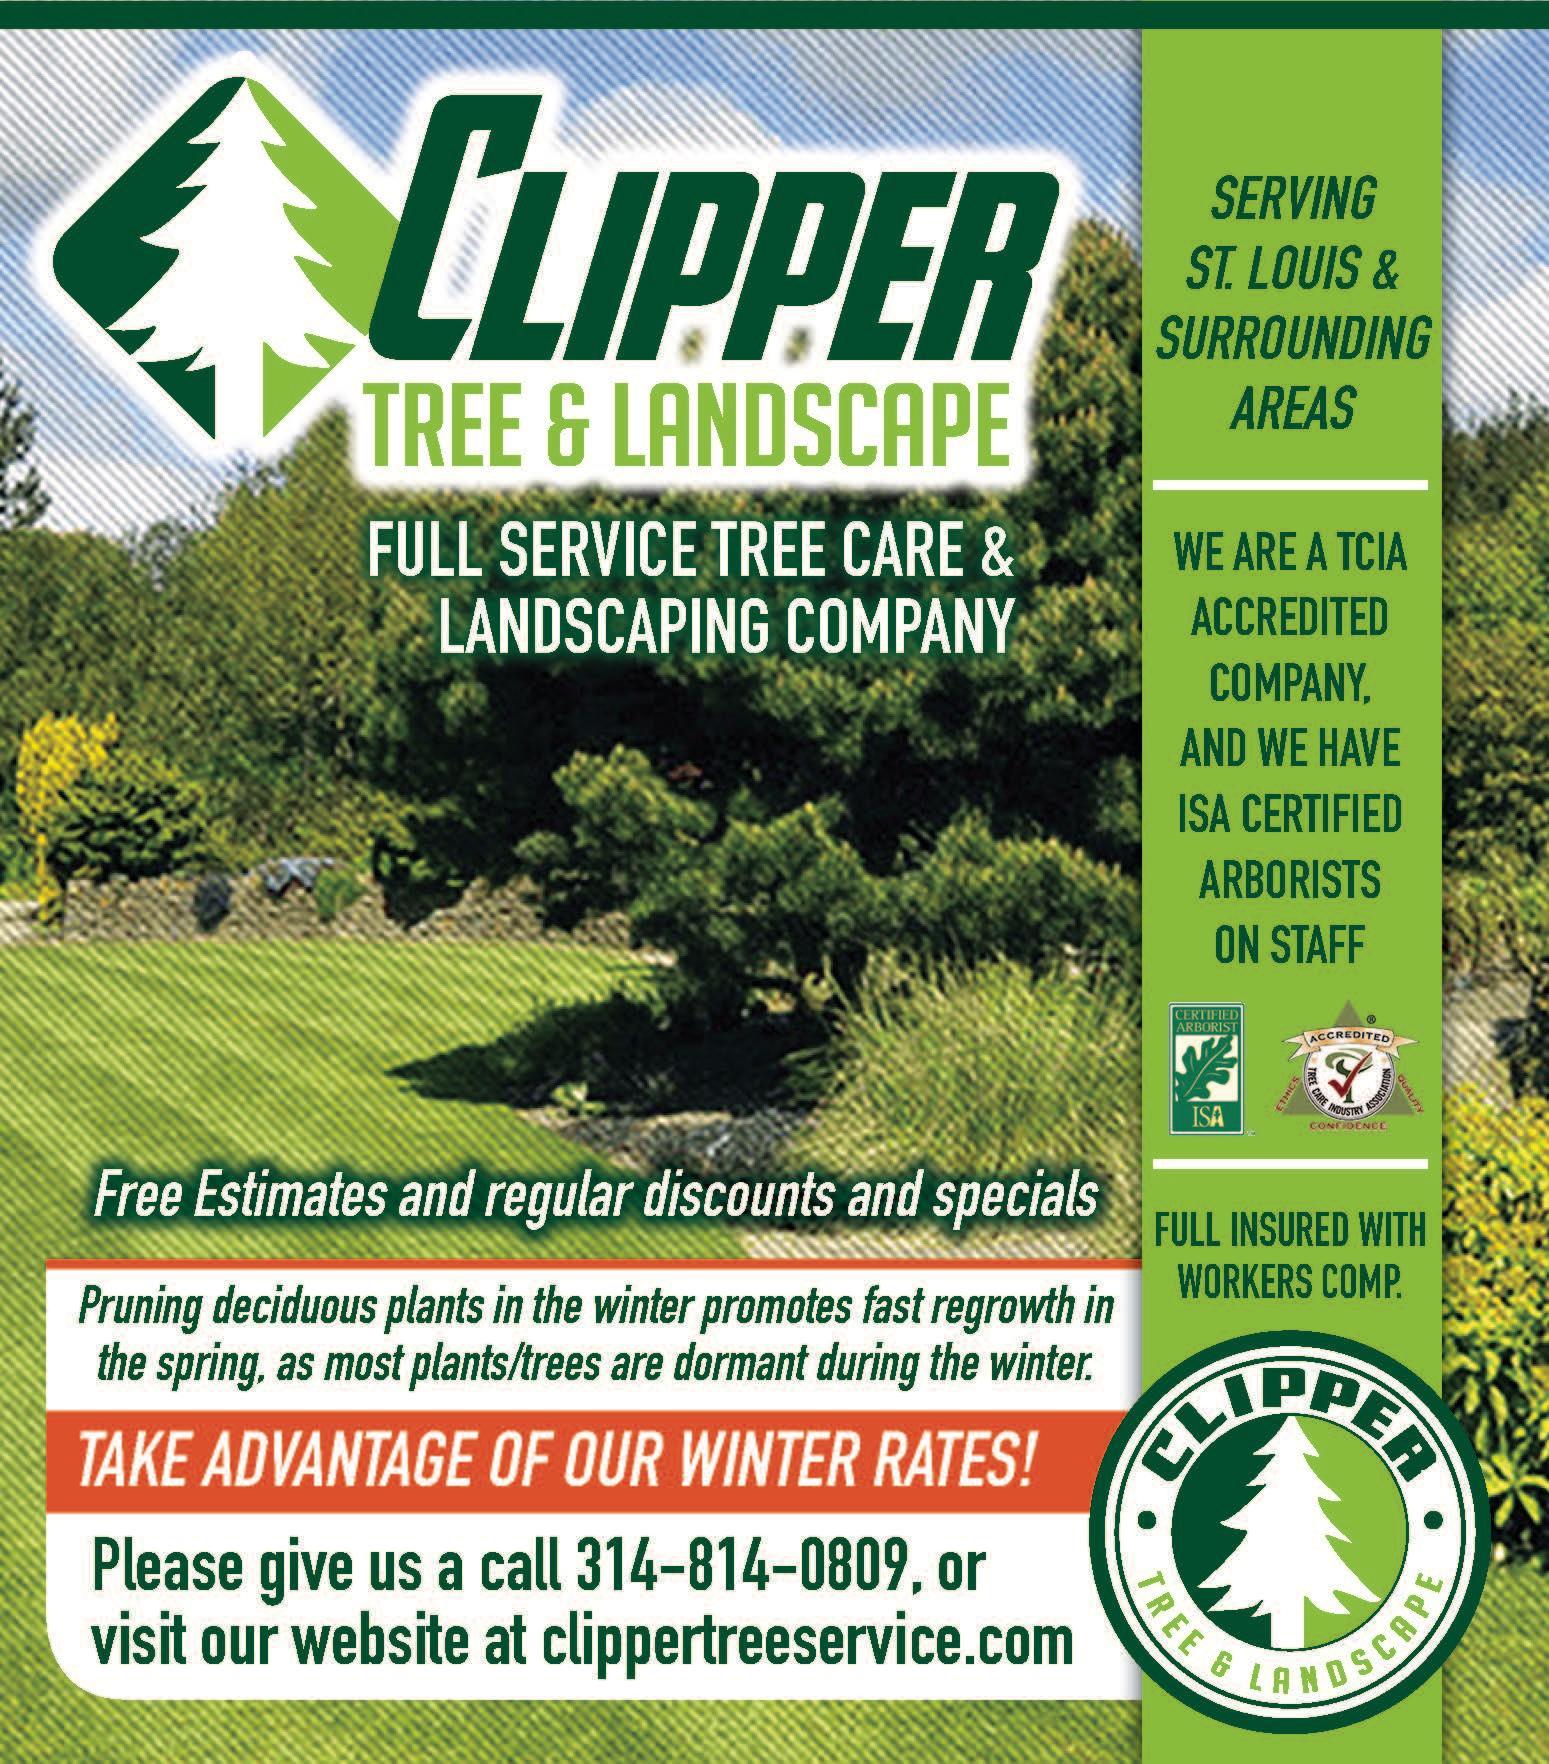 Clipper Tree & Landscape, Inc. image 16